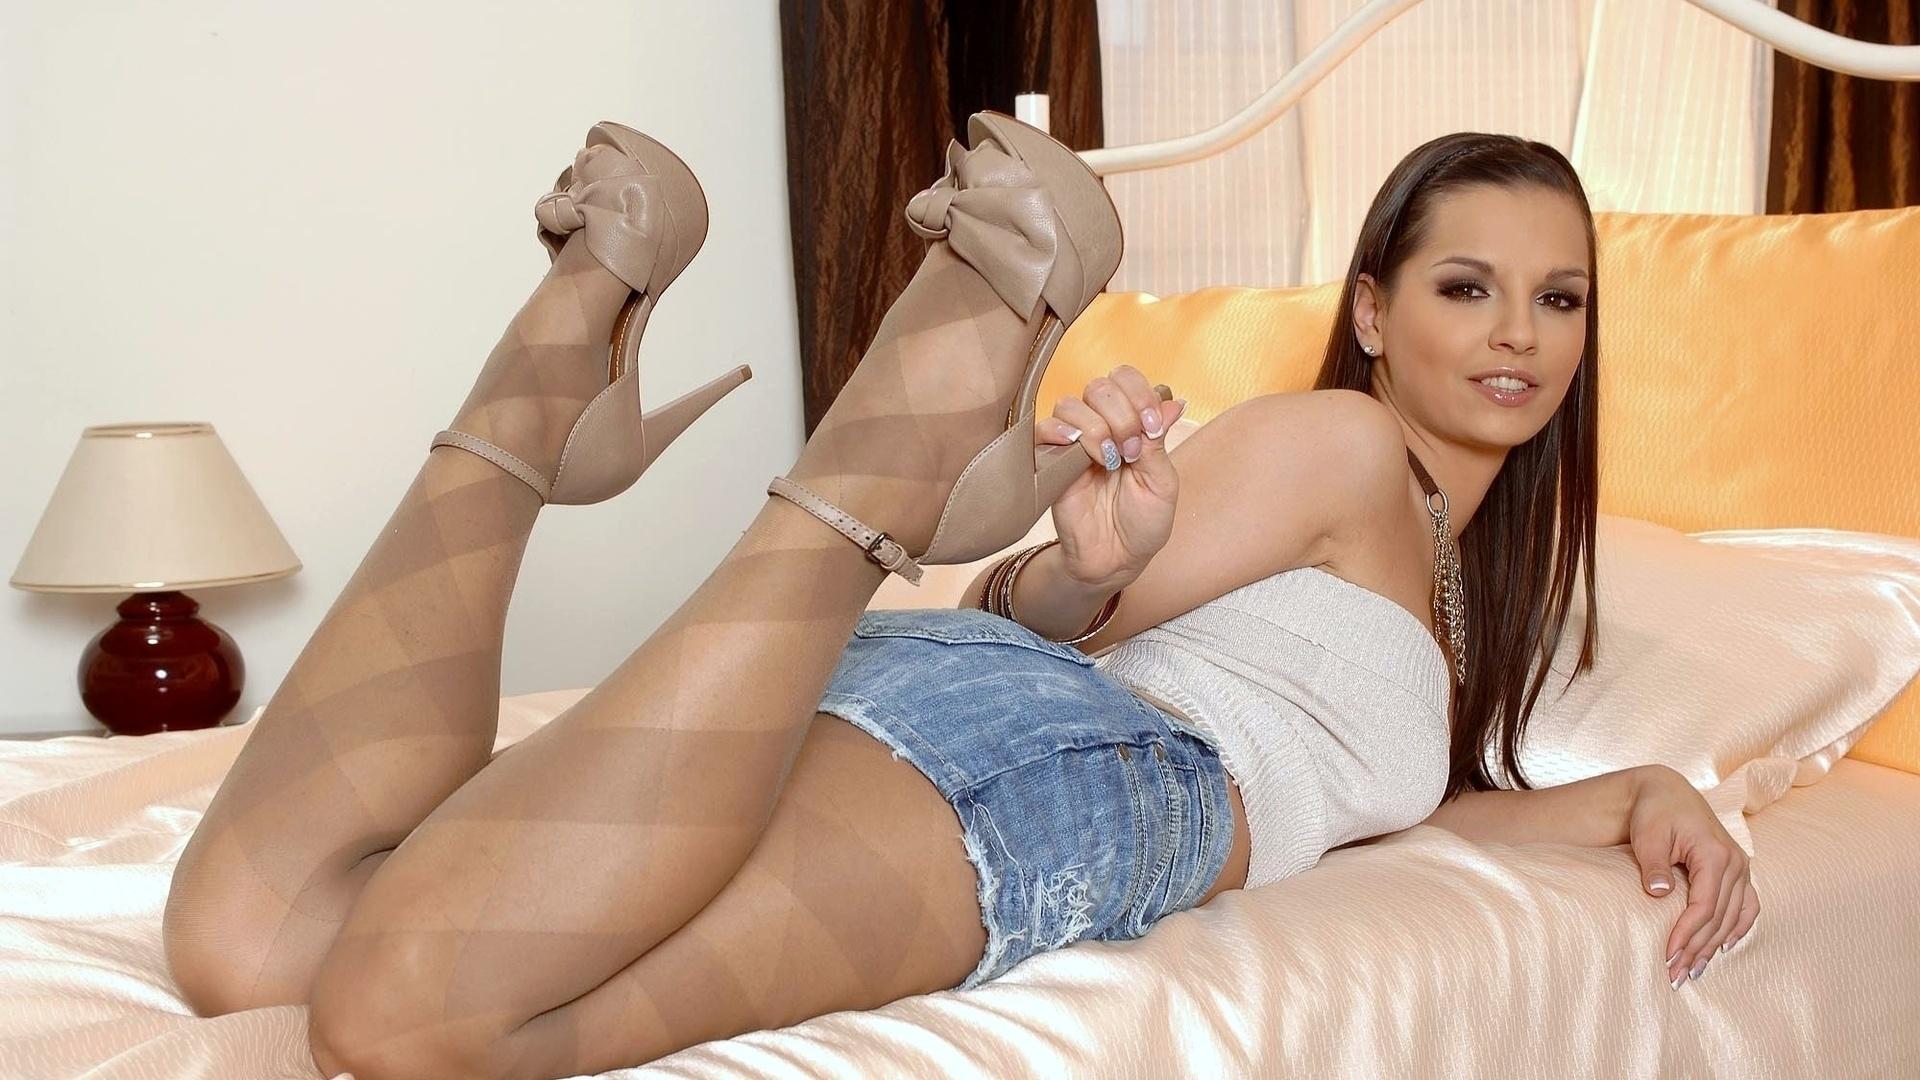 Ххх ножки девушек фото, Голые ножки фото - обнаженные ноги девушек 1 фотография